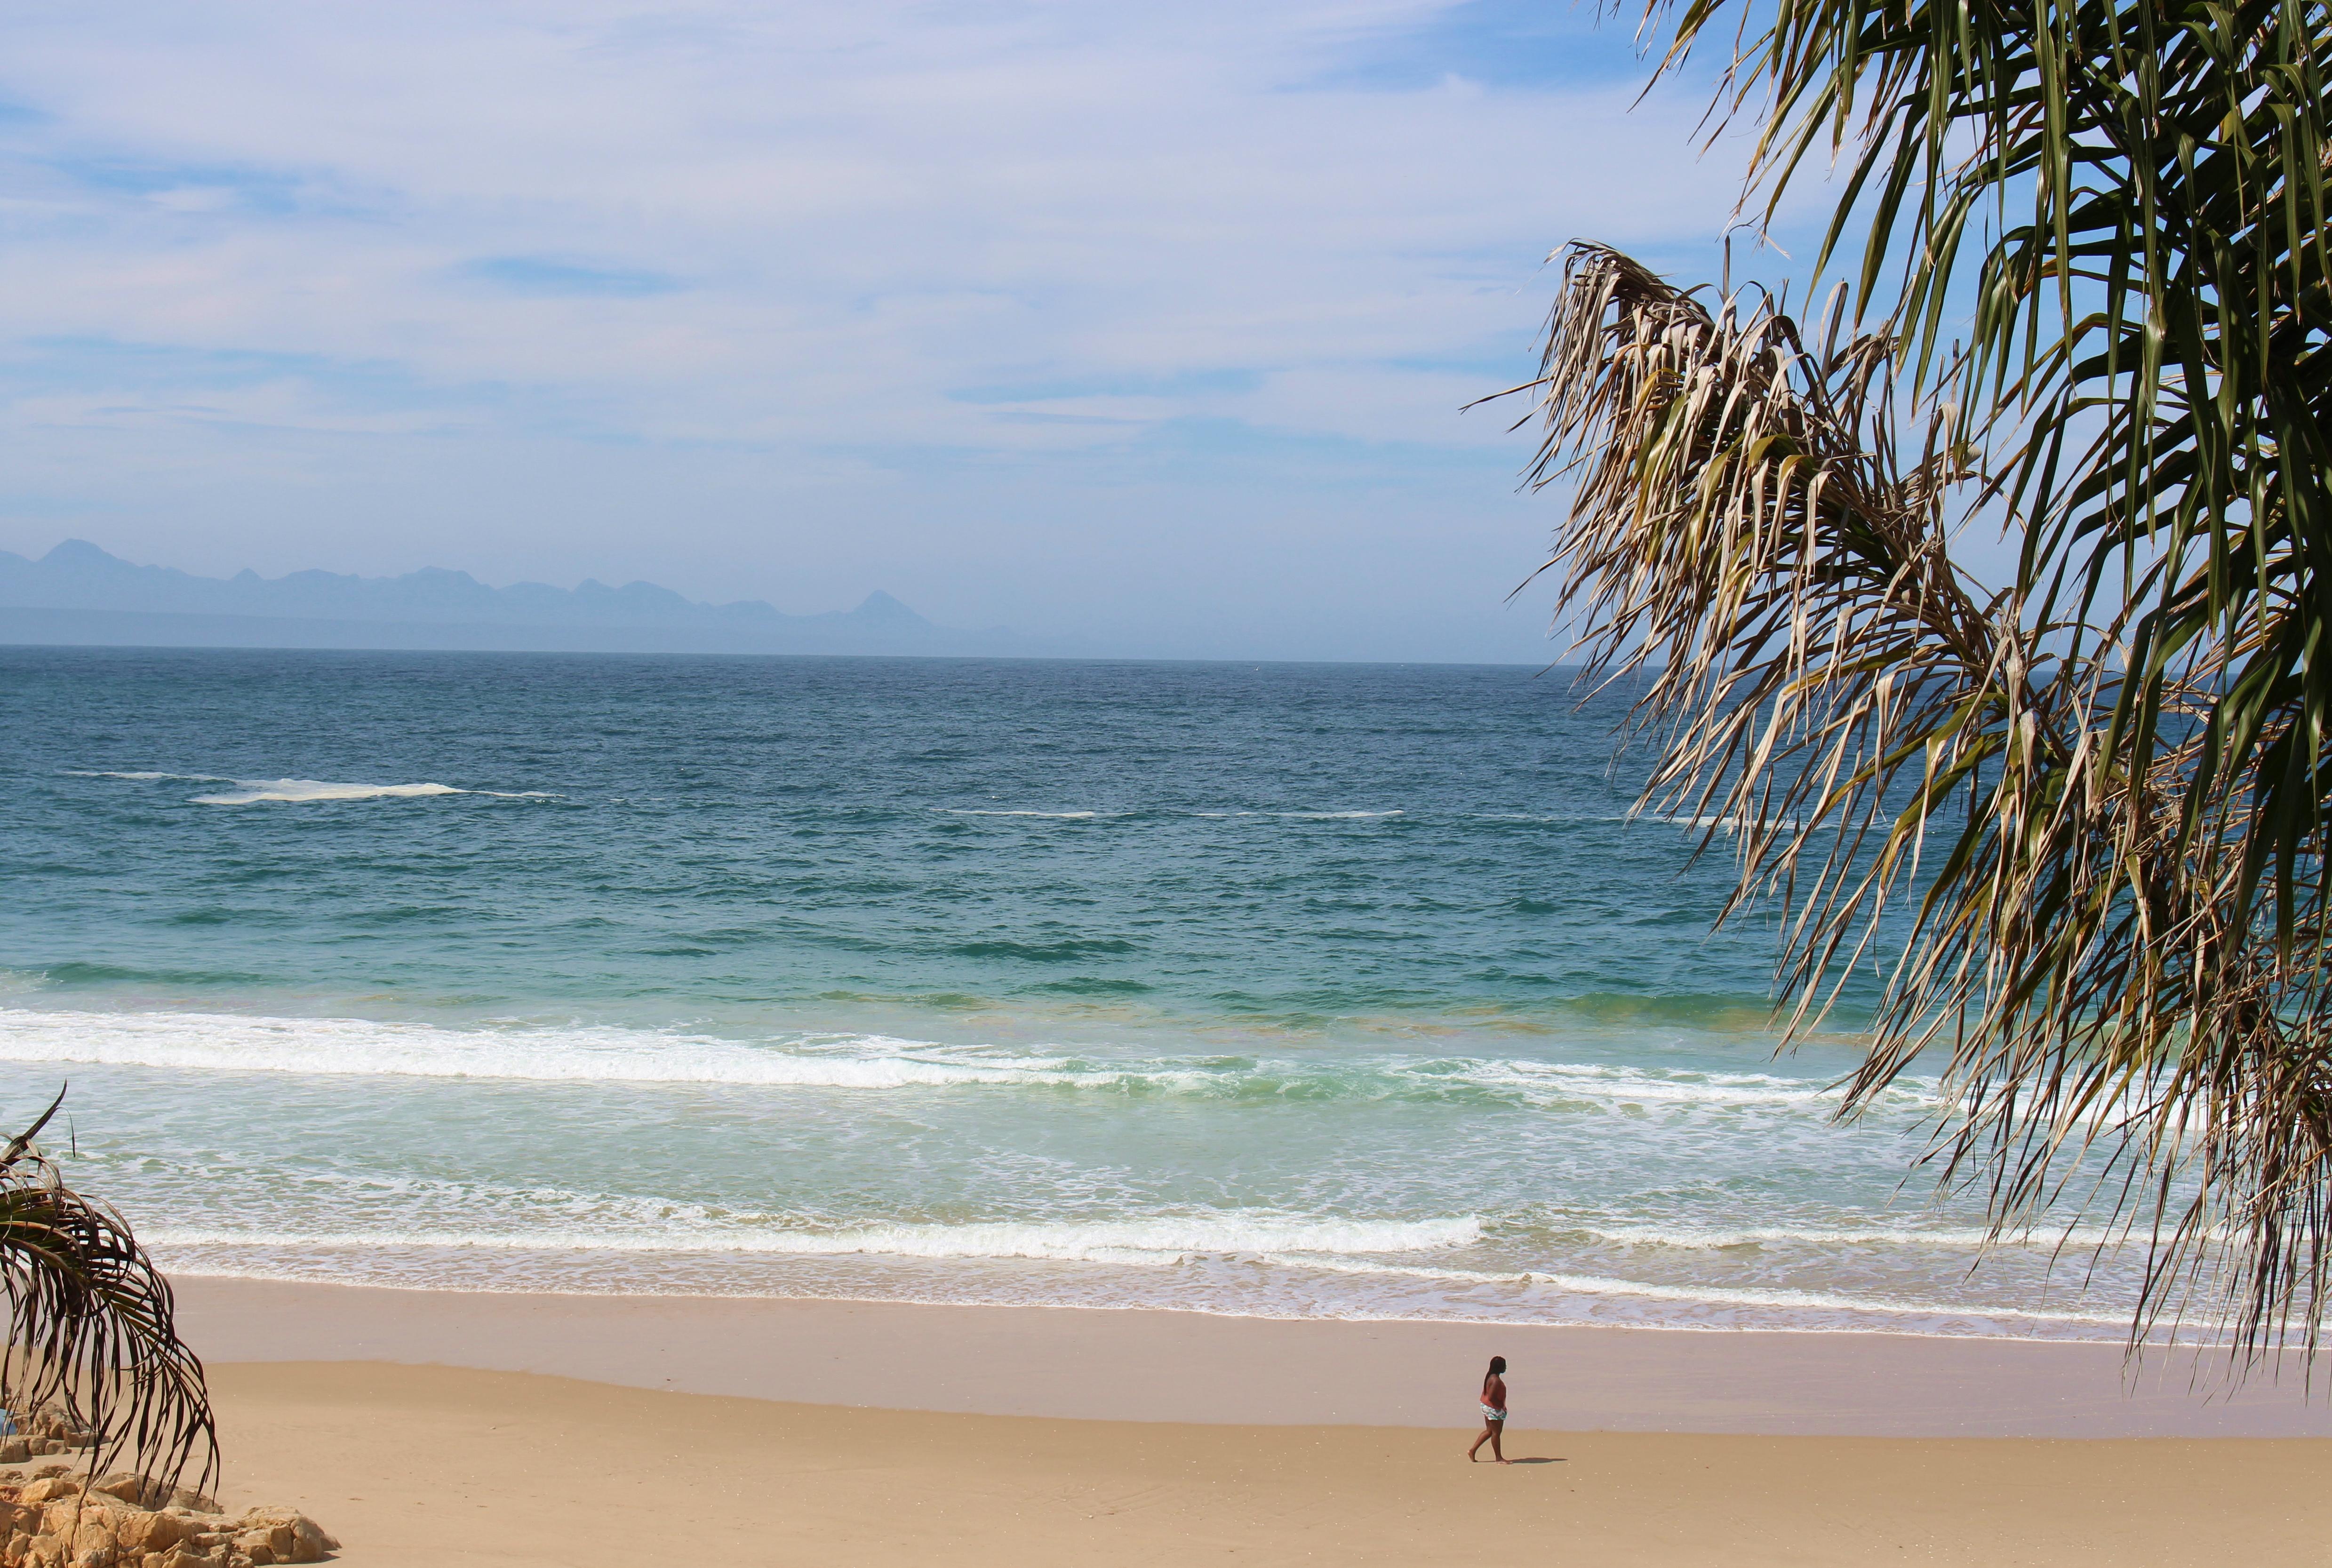 Plettenberg Bay Beach